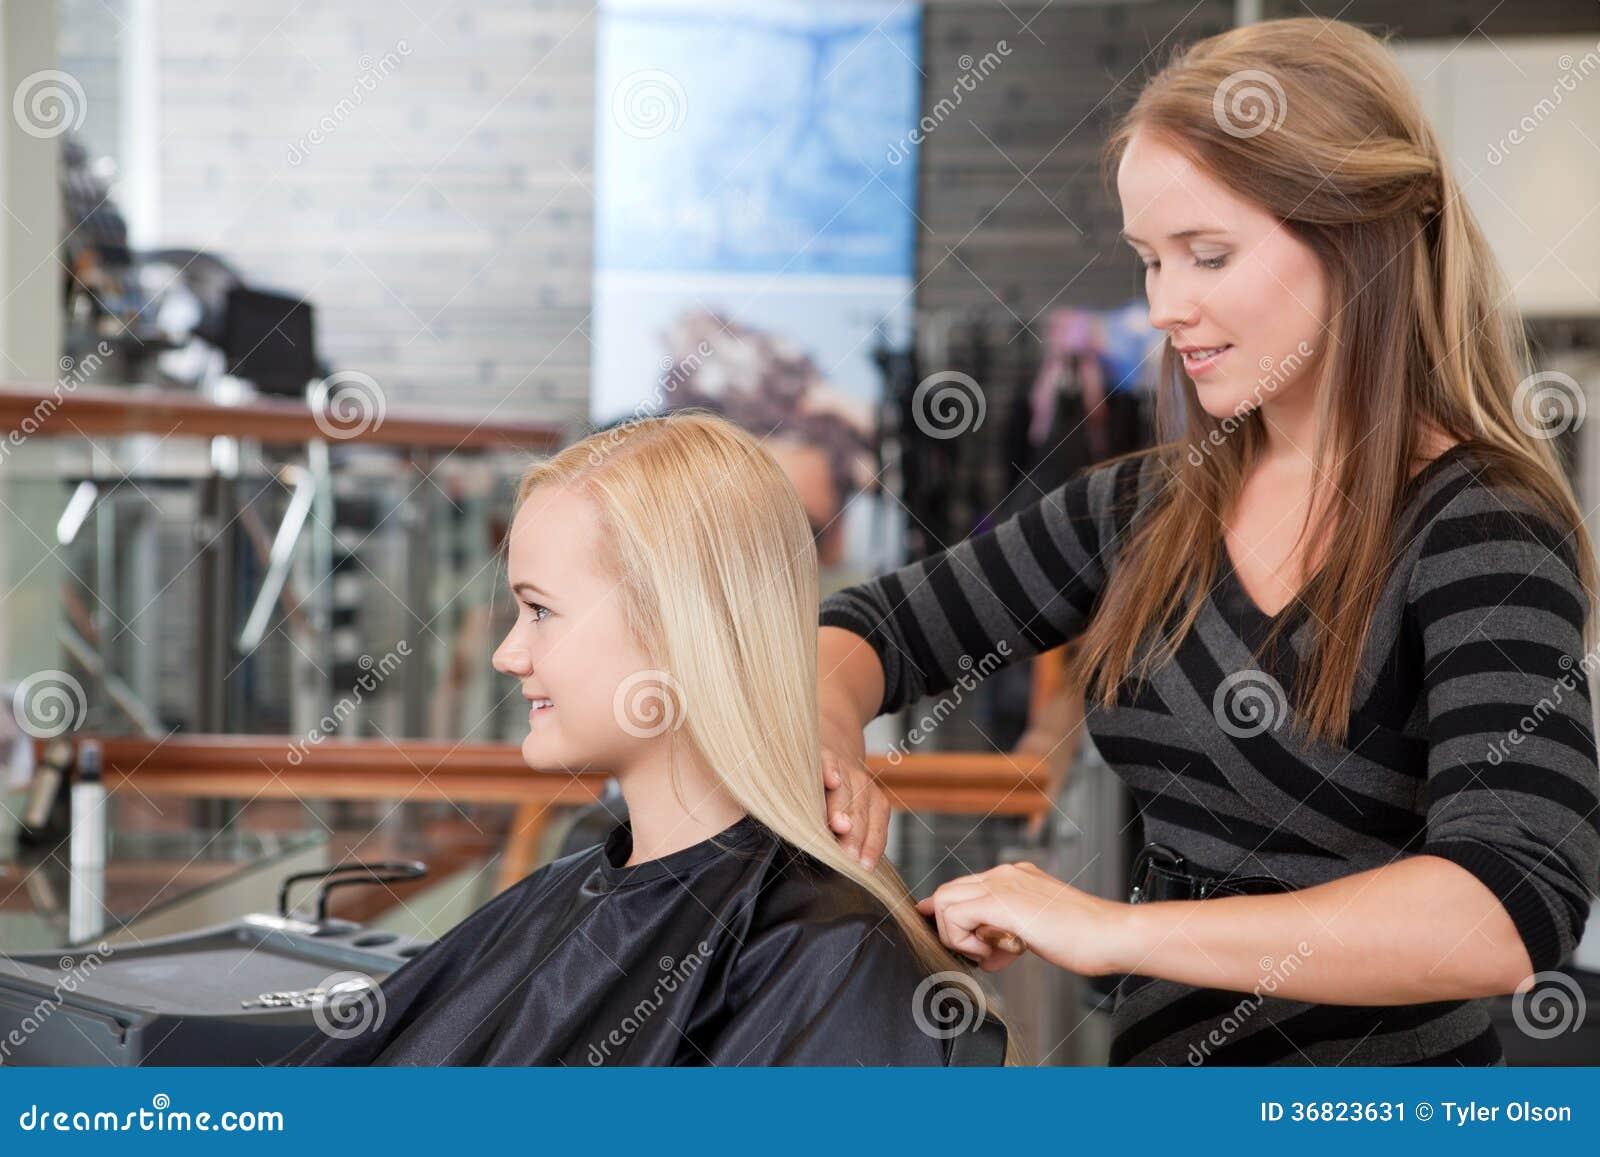 Frisör Brushing Customers Hair